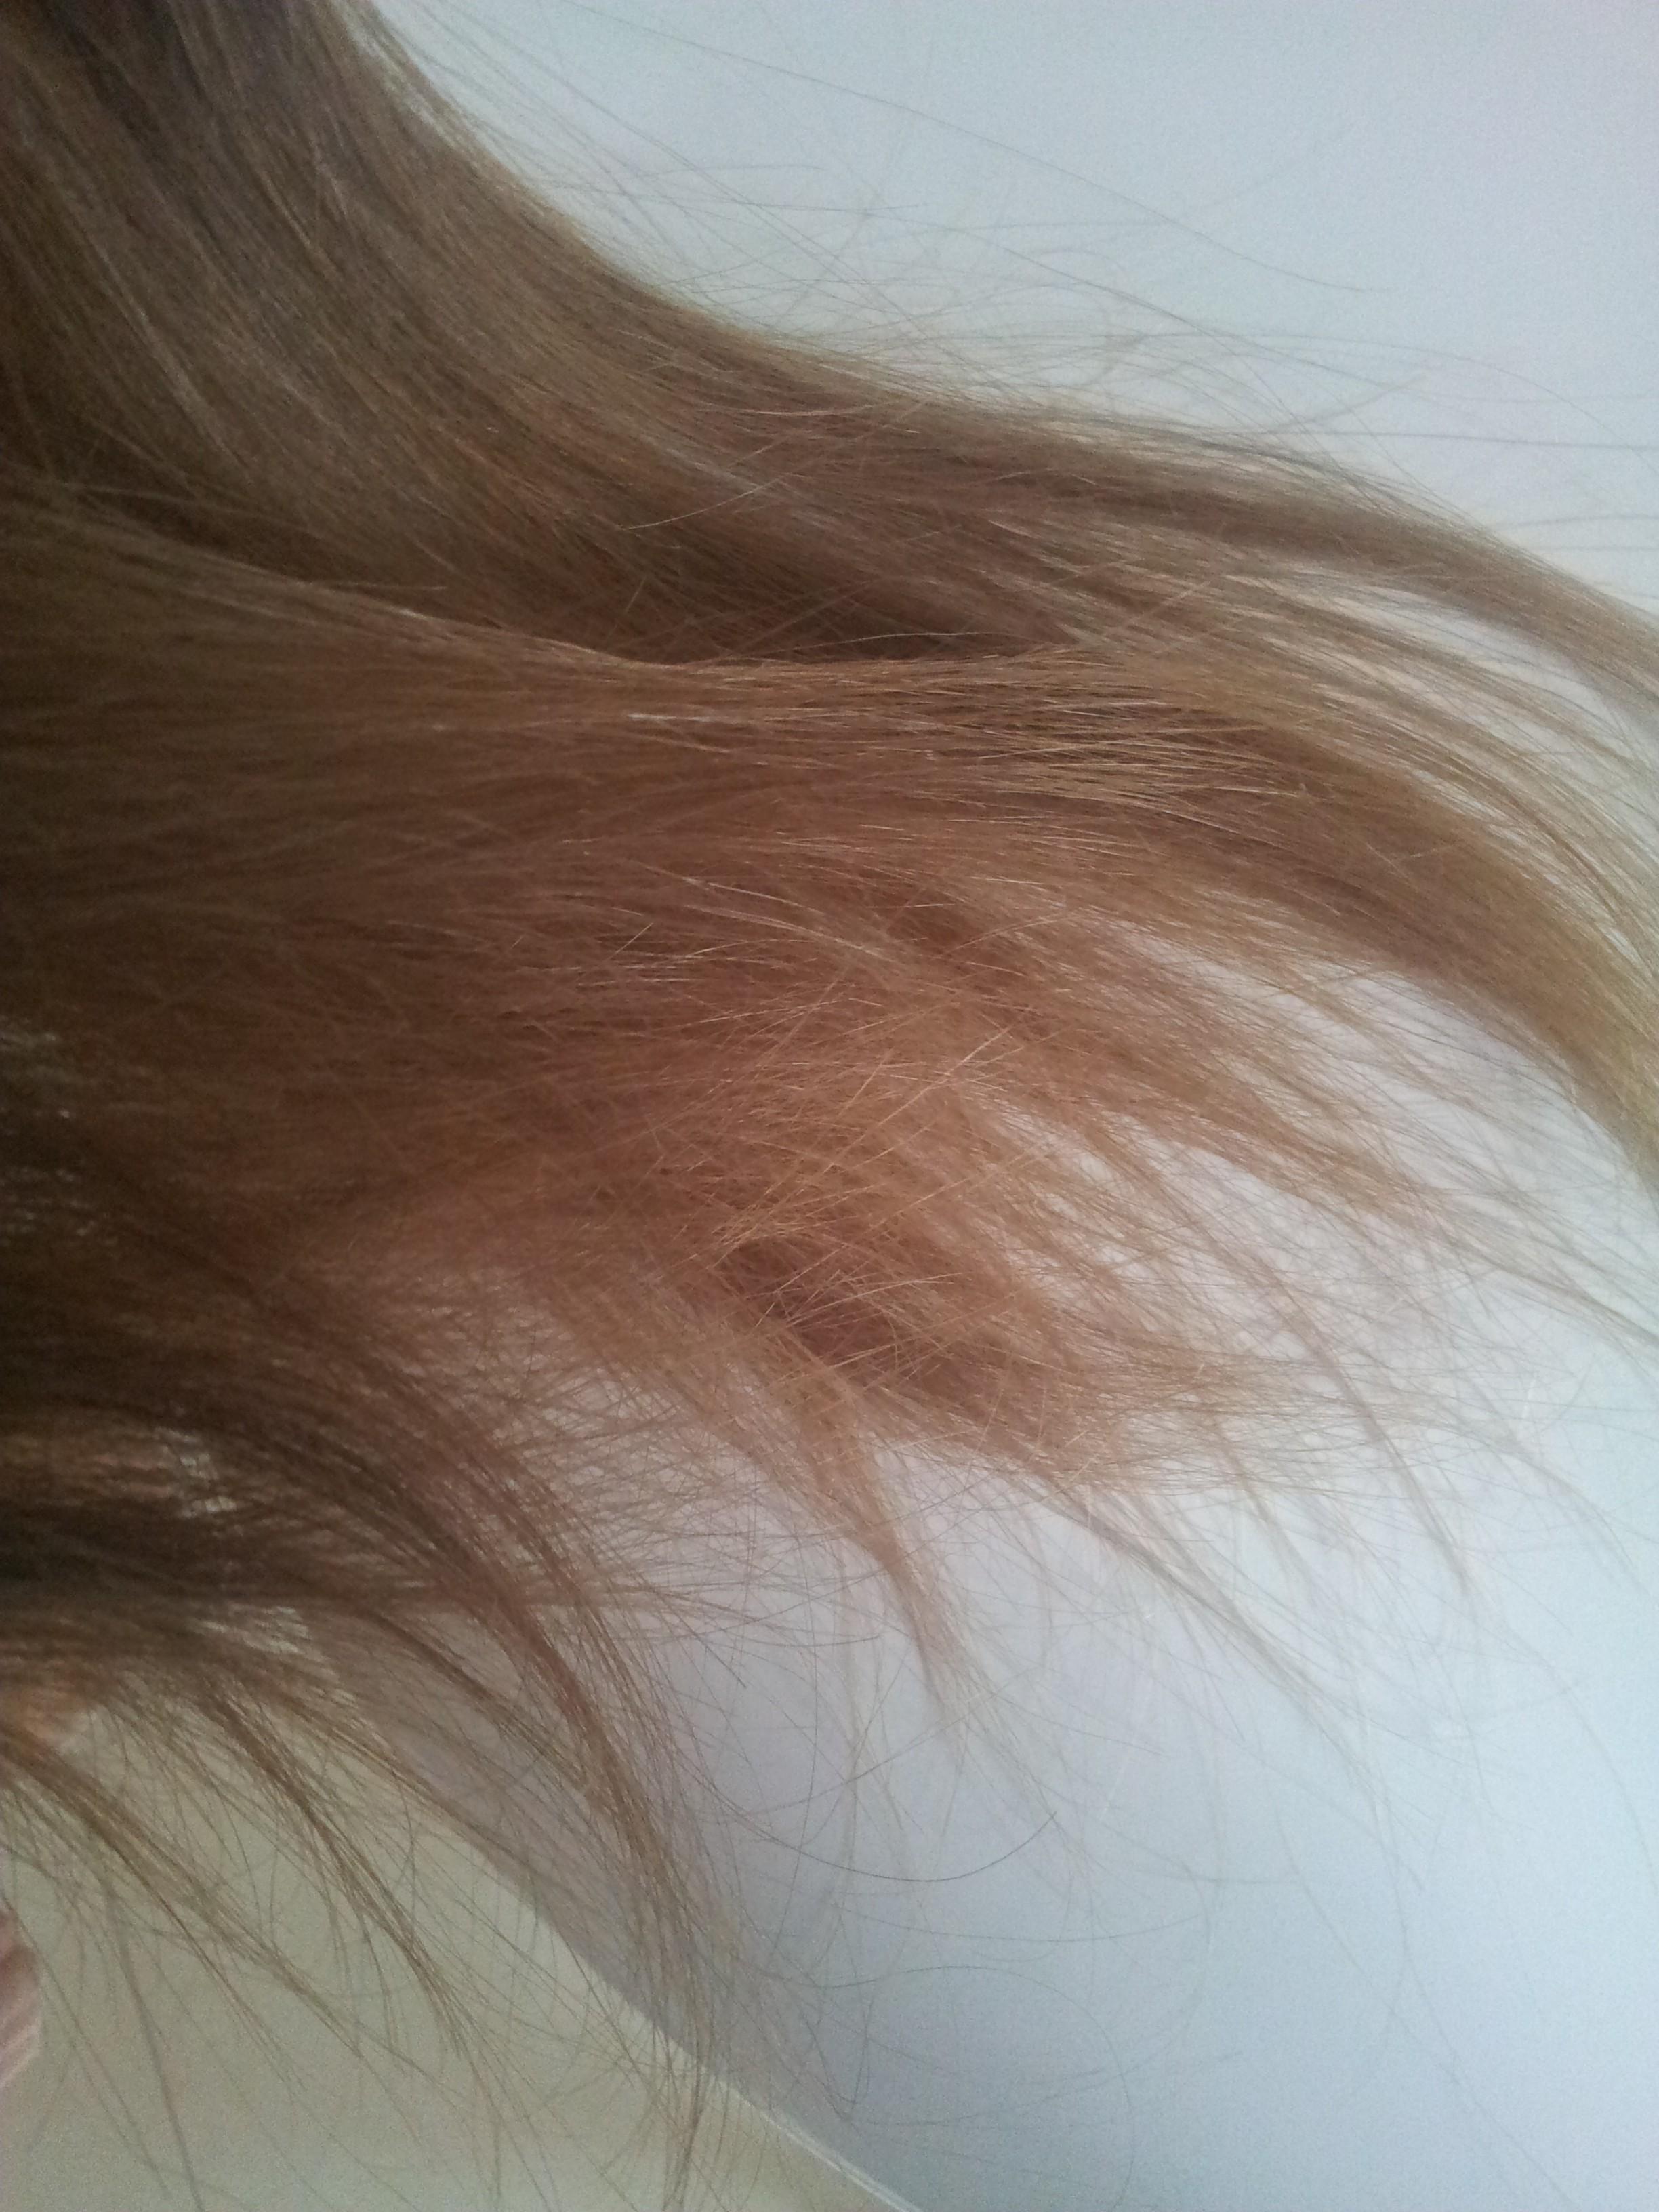 haare blau petrol f rben farbe haarfarbe blond. Black Bedroom Furniture Sets. Home Design Ideas